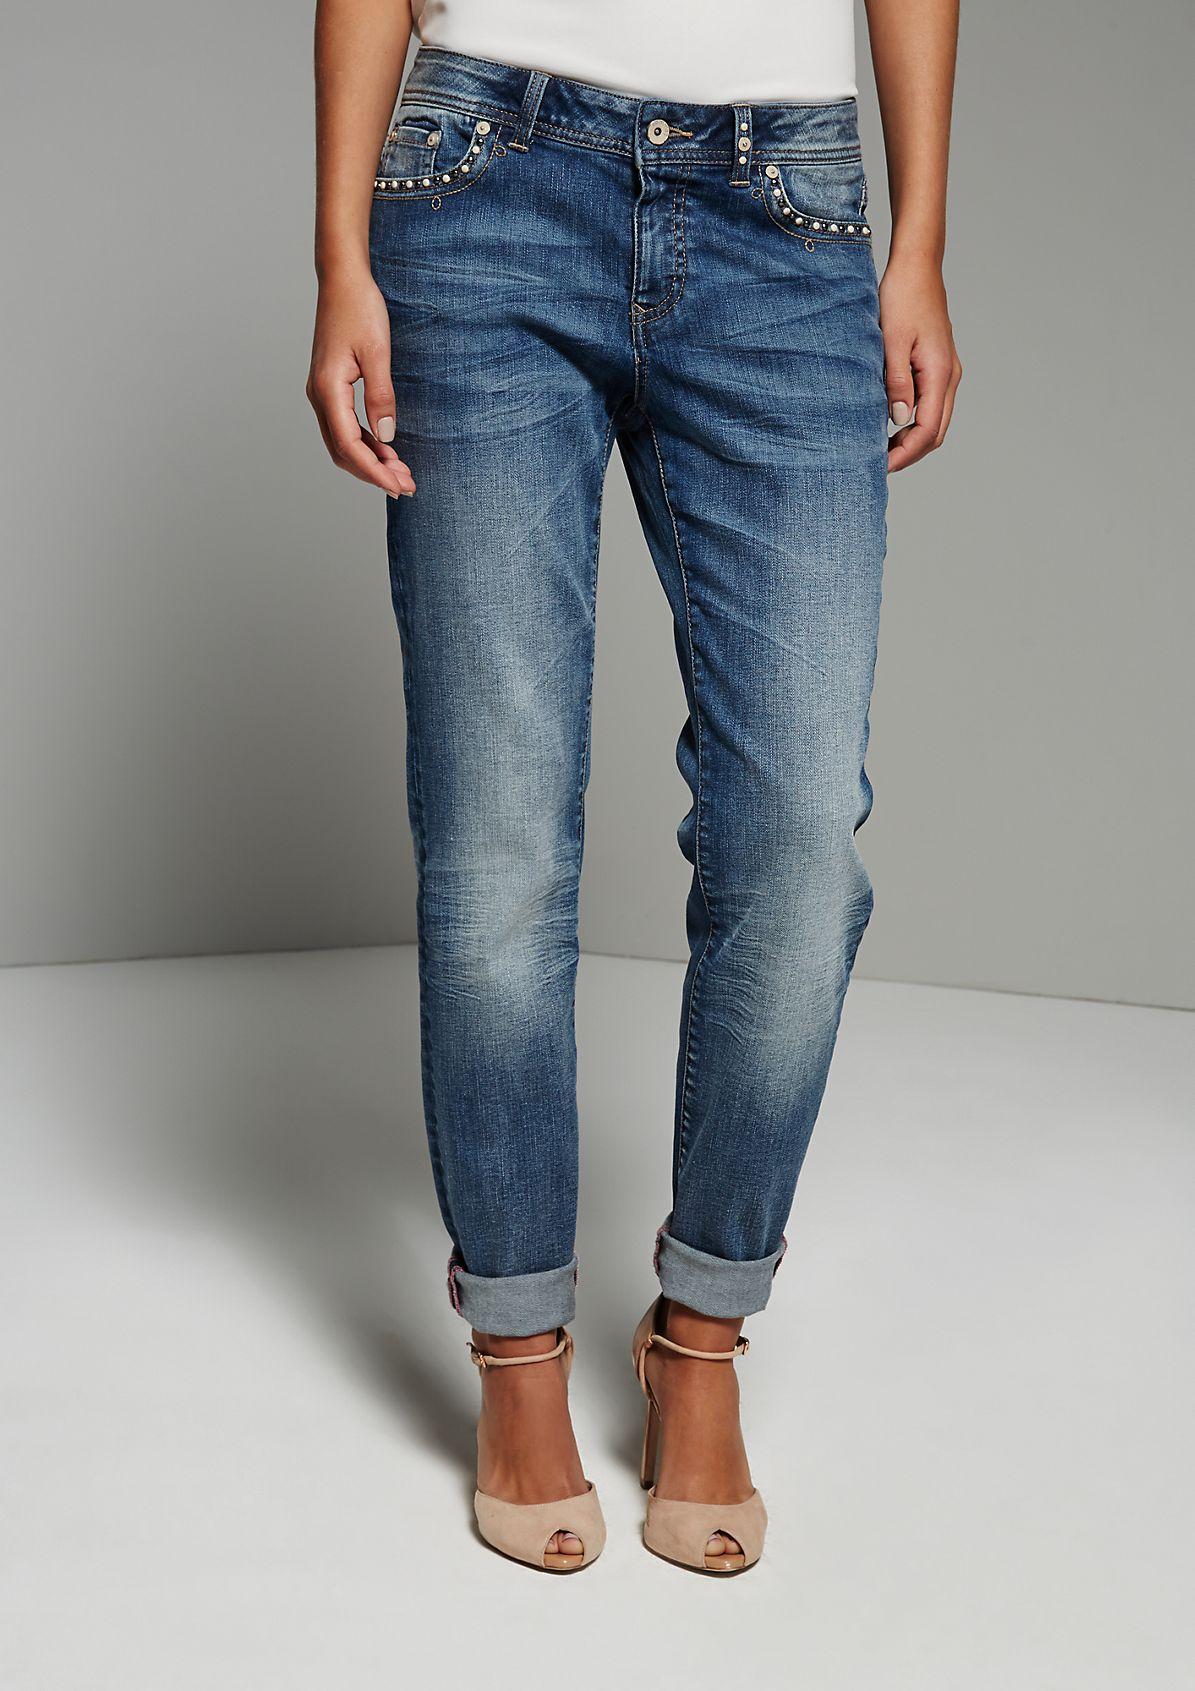 boyfriend jeans fashion mode comma online. Black Bedroom Furniture Sets. Home Design Ideas